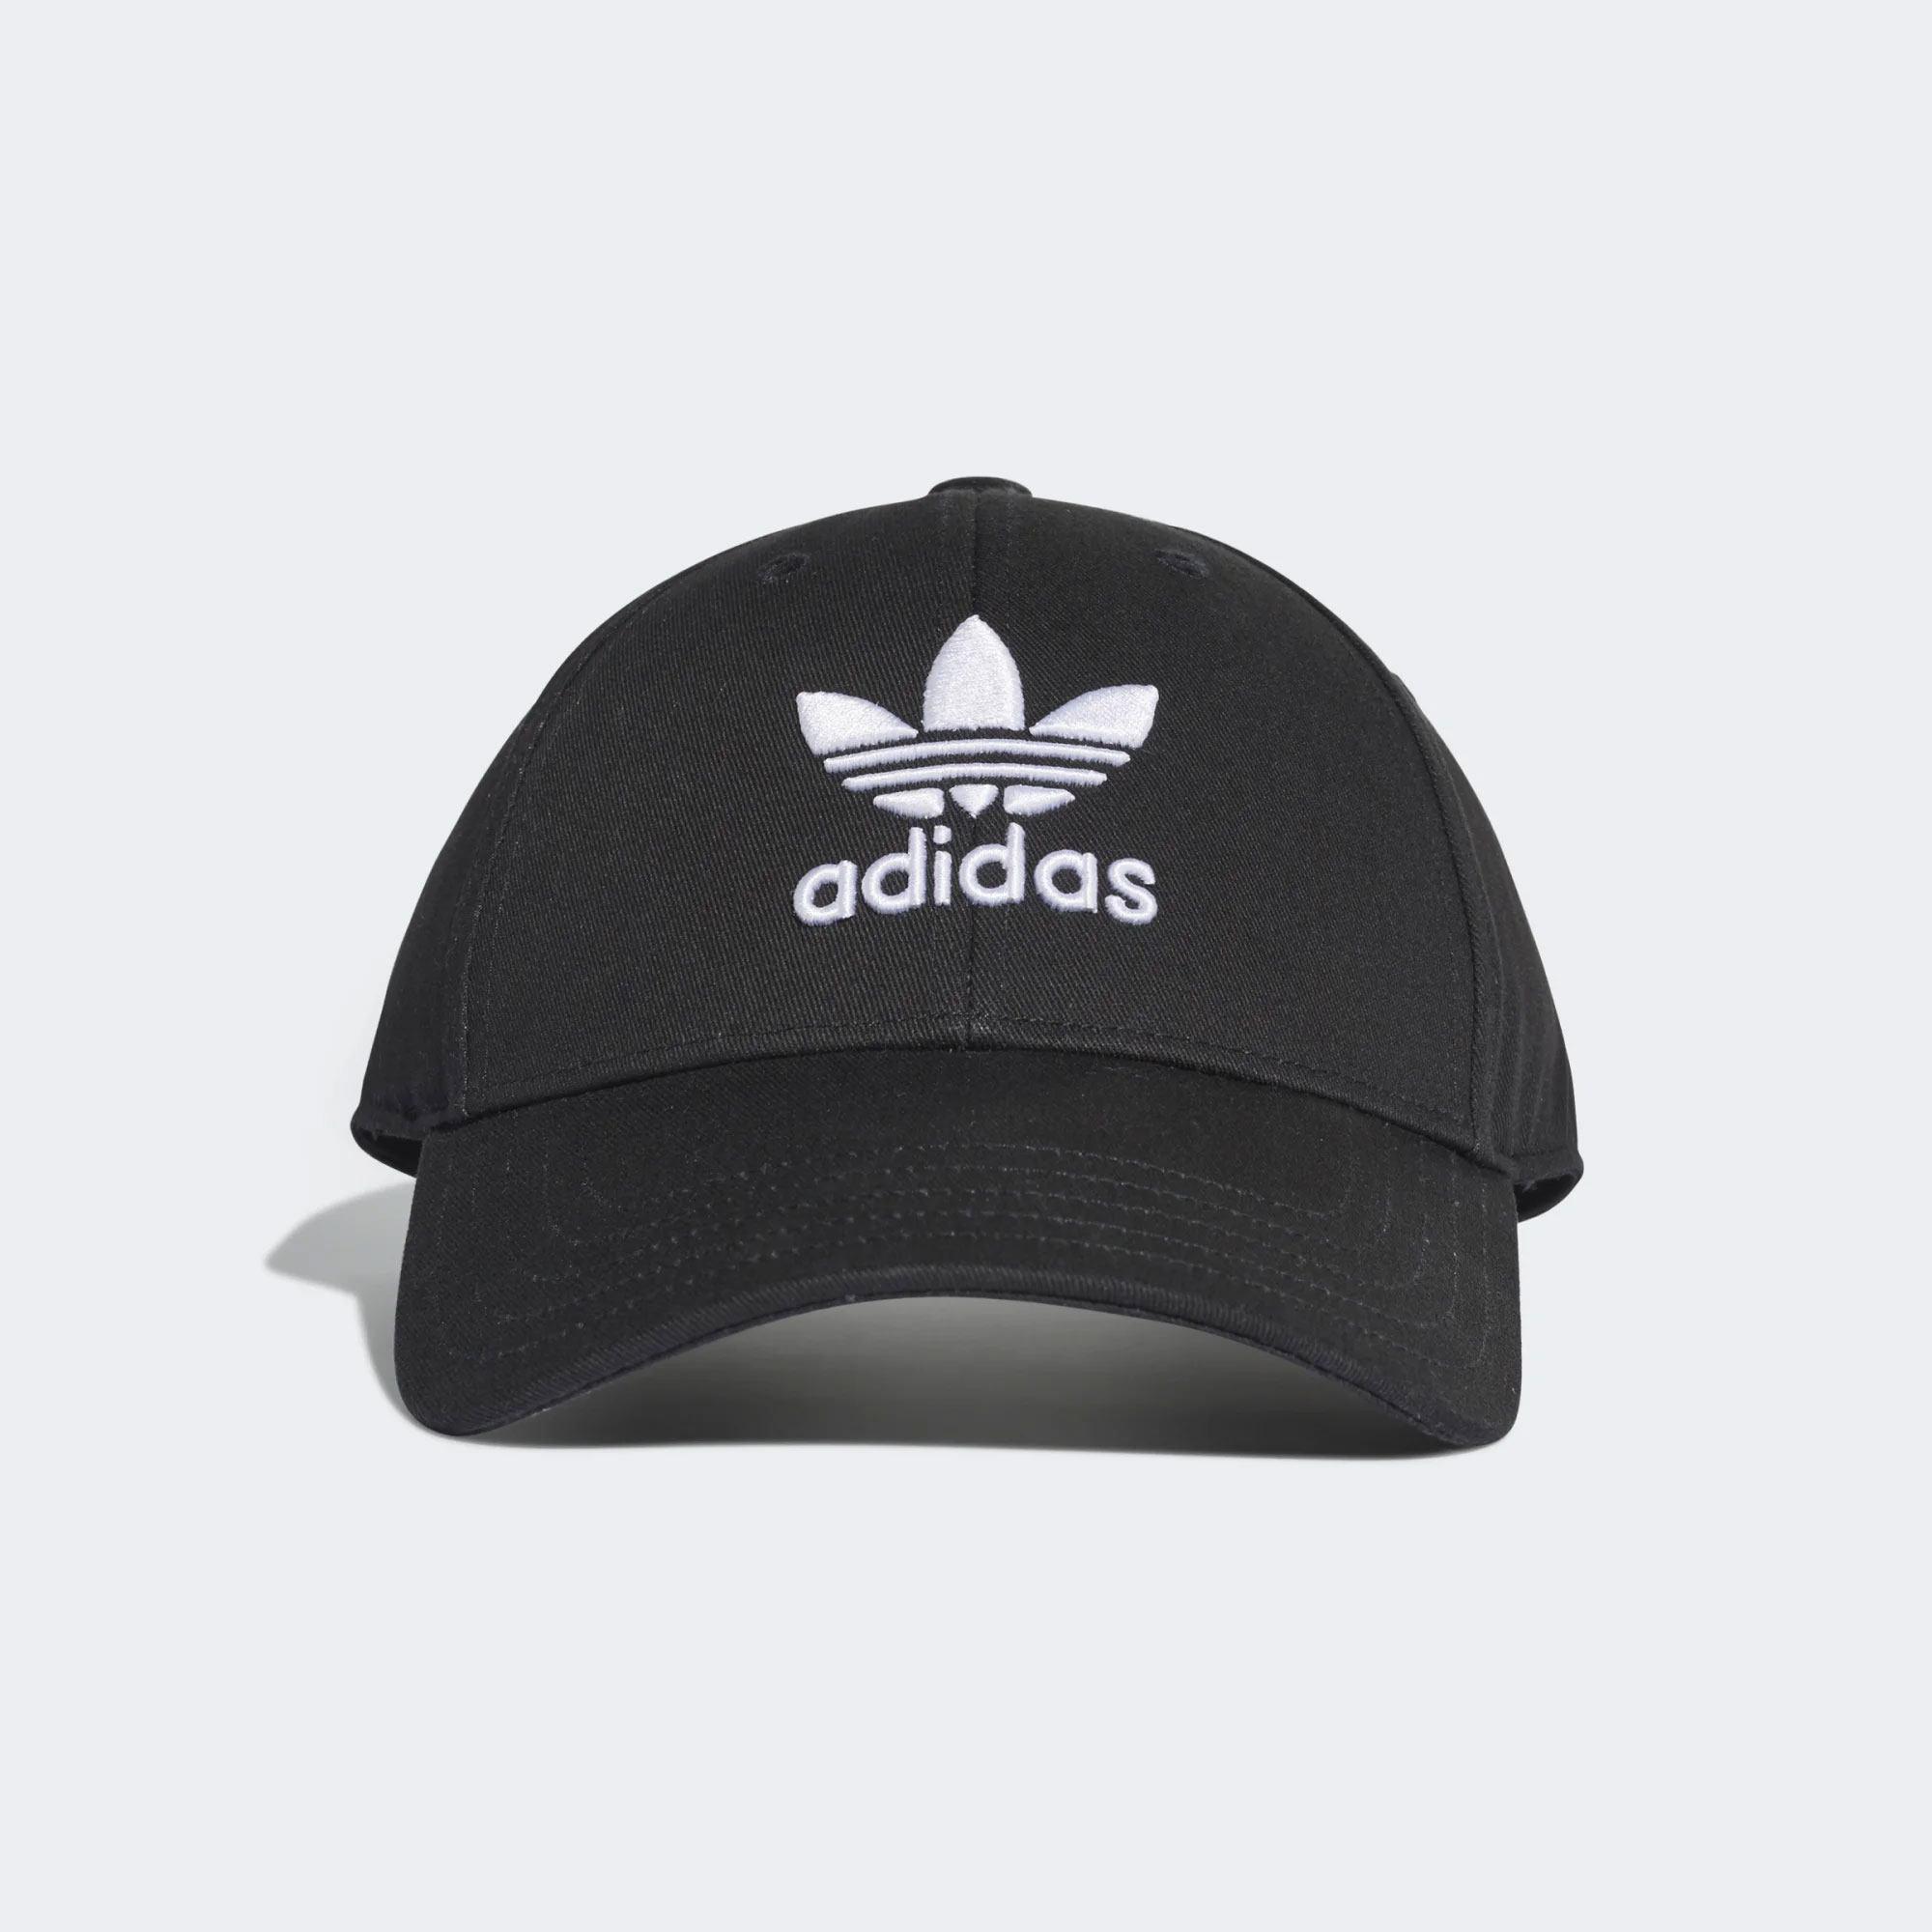 adidas Originals Trefoil Baseball Cap (9000033293_1480)